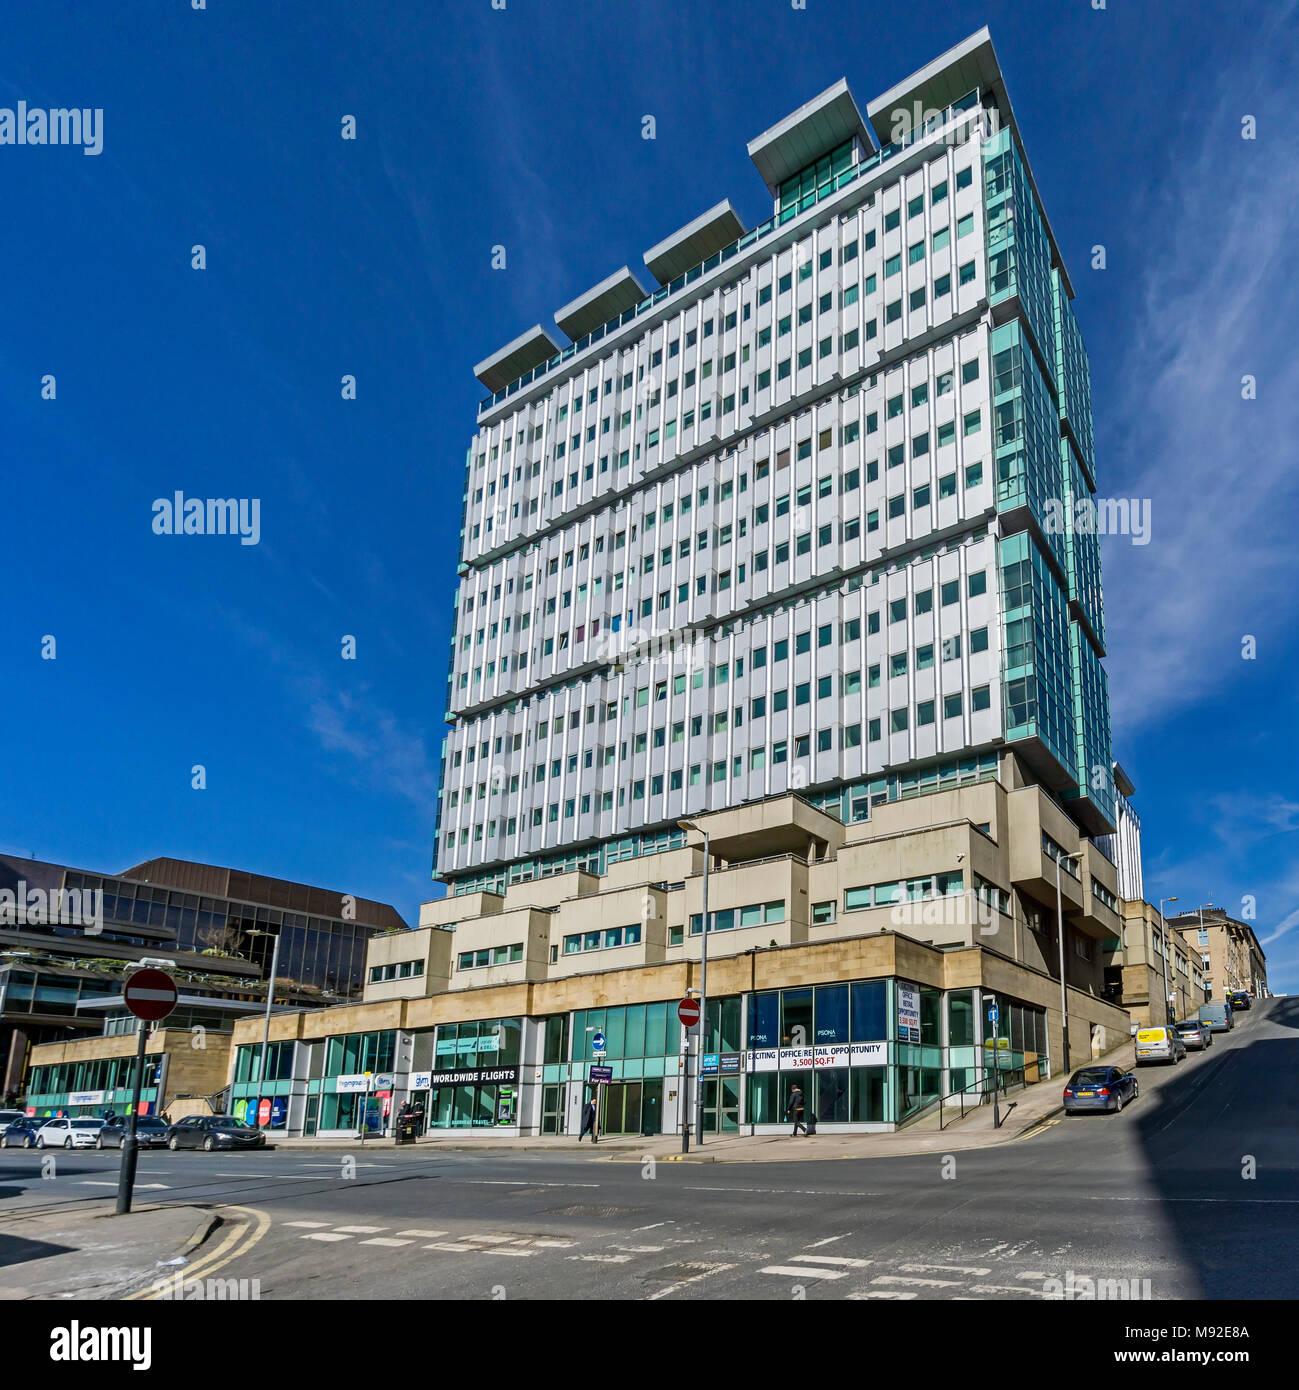 The Pinnacle Building in Bothwell Street Glasgow Scotland UK - Stock Image